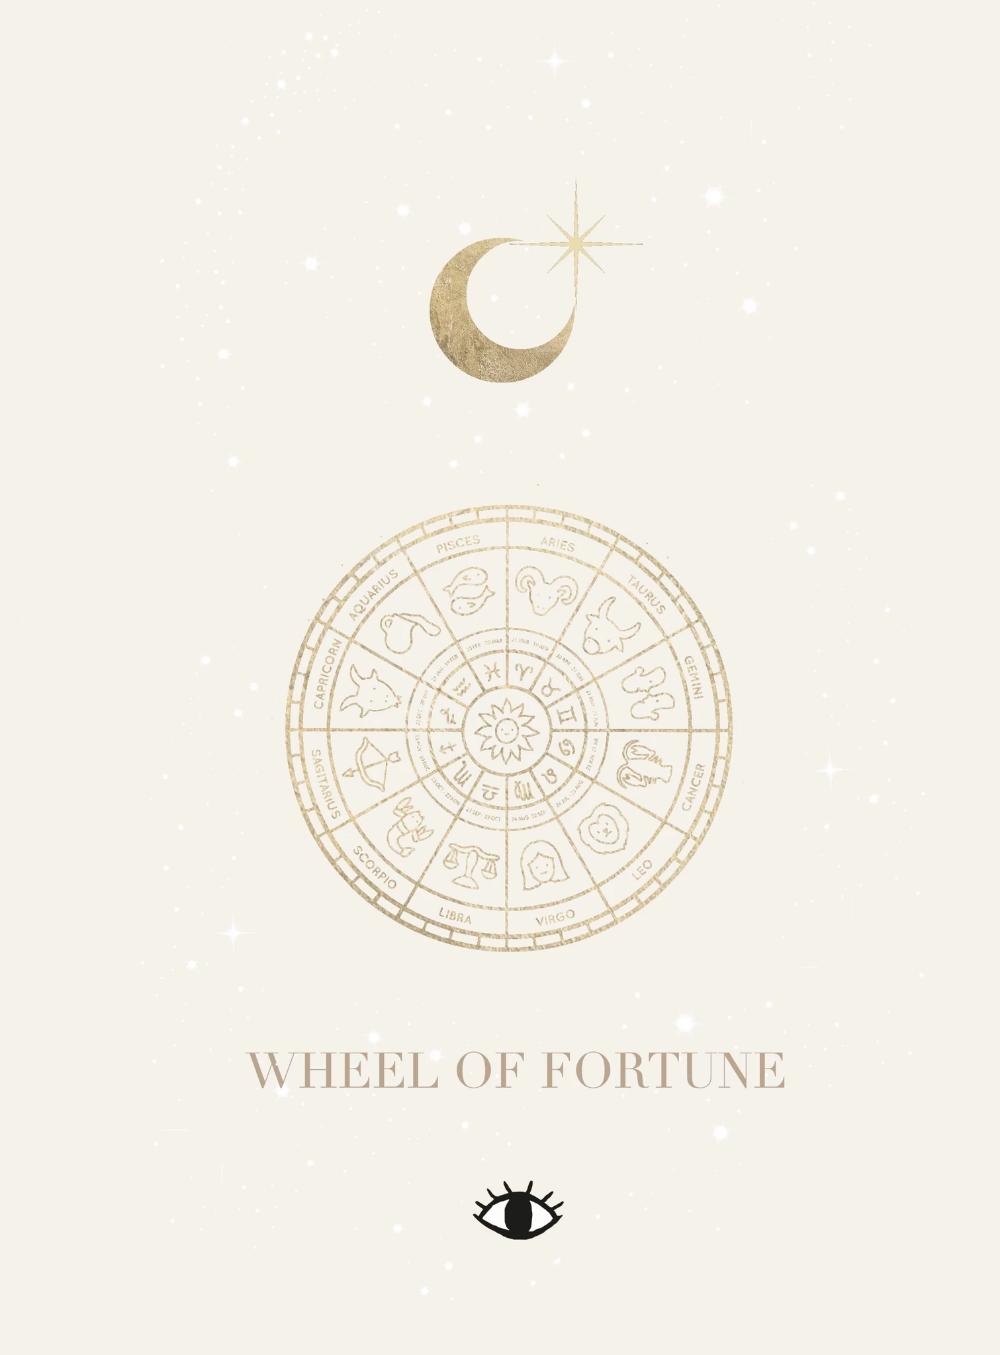 Moondust Tarot Deck Tarot Cards Art Wheel Of Fortune Tarot The Moon Tarot Card